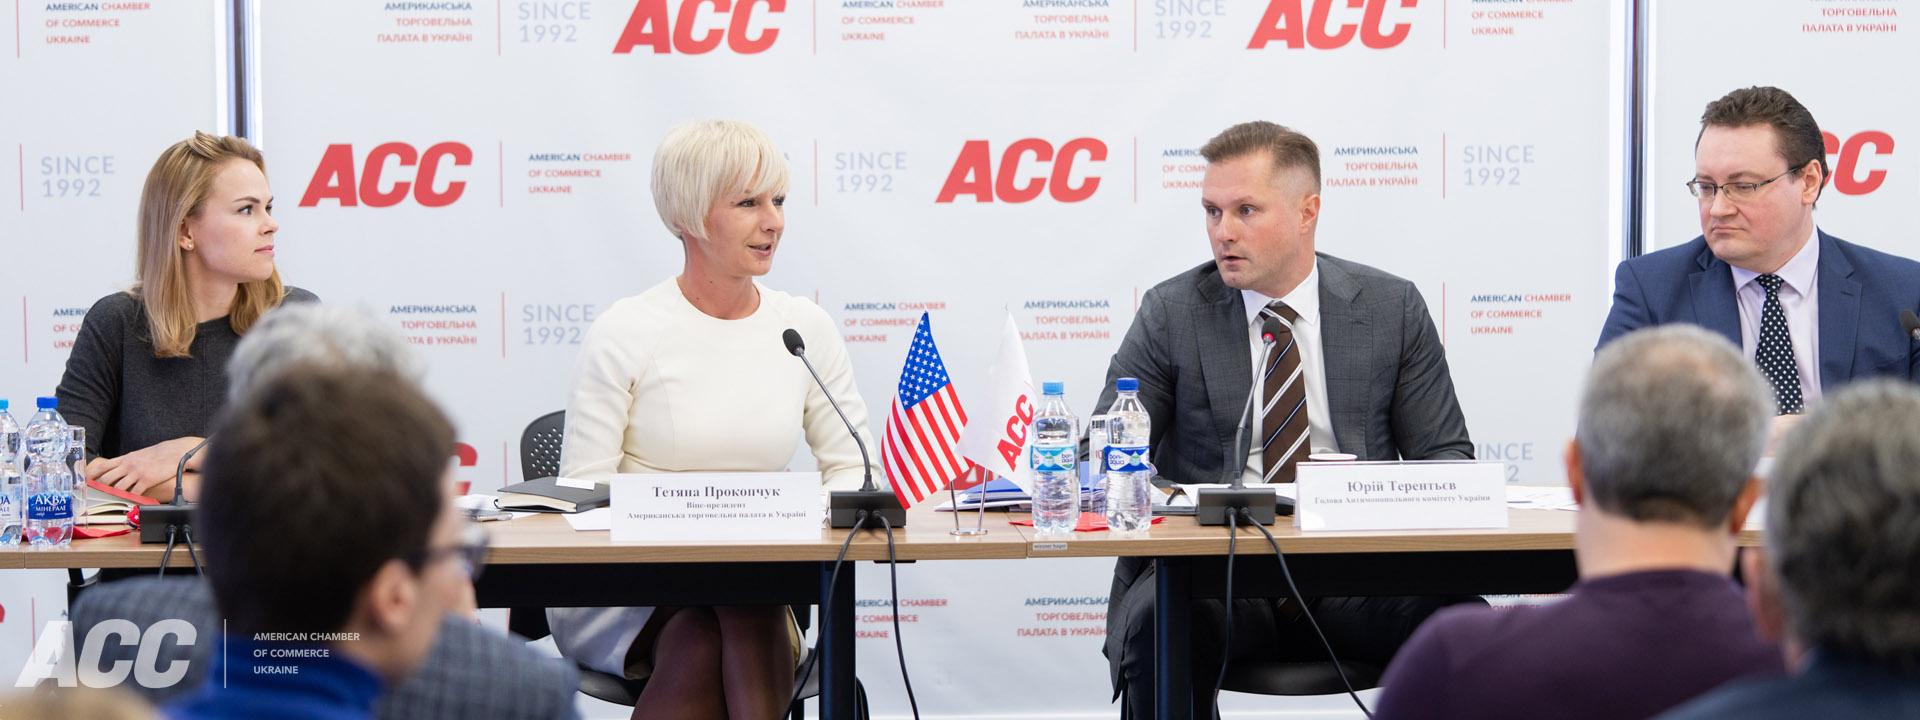 Meeting with Yuriy Terentyev, Head of the Antimonopoly Committee of Ukraine